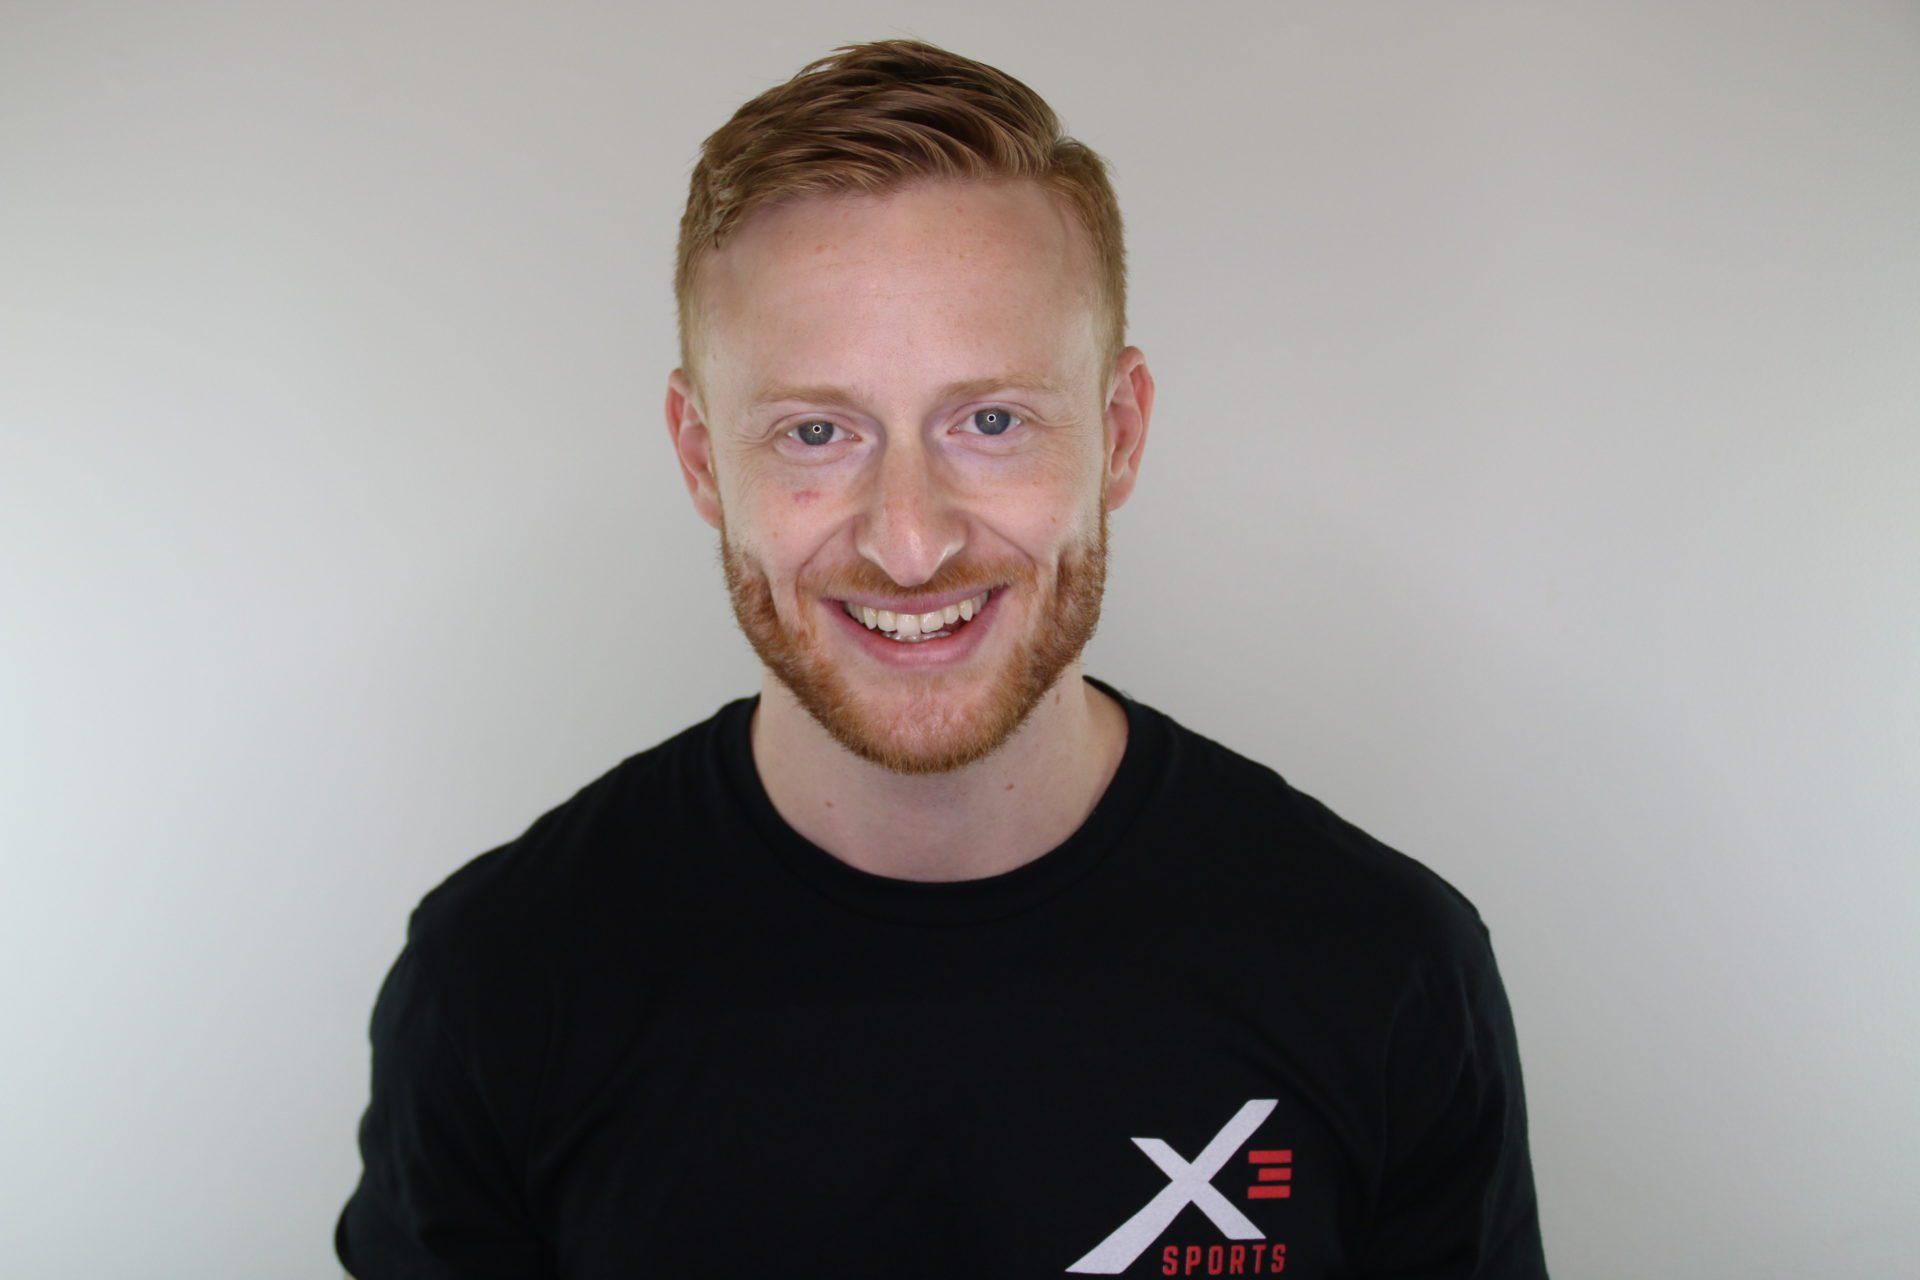 Justin Matthew Burns | X3 Sports Employee | X3 Sports